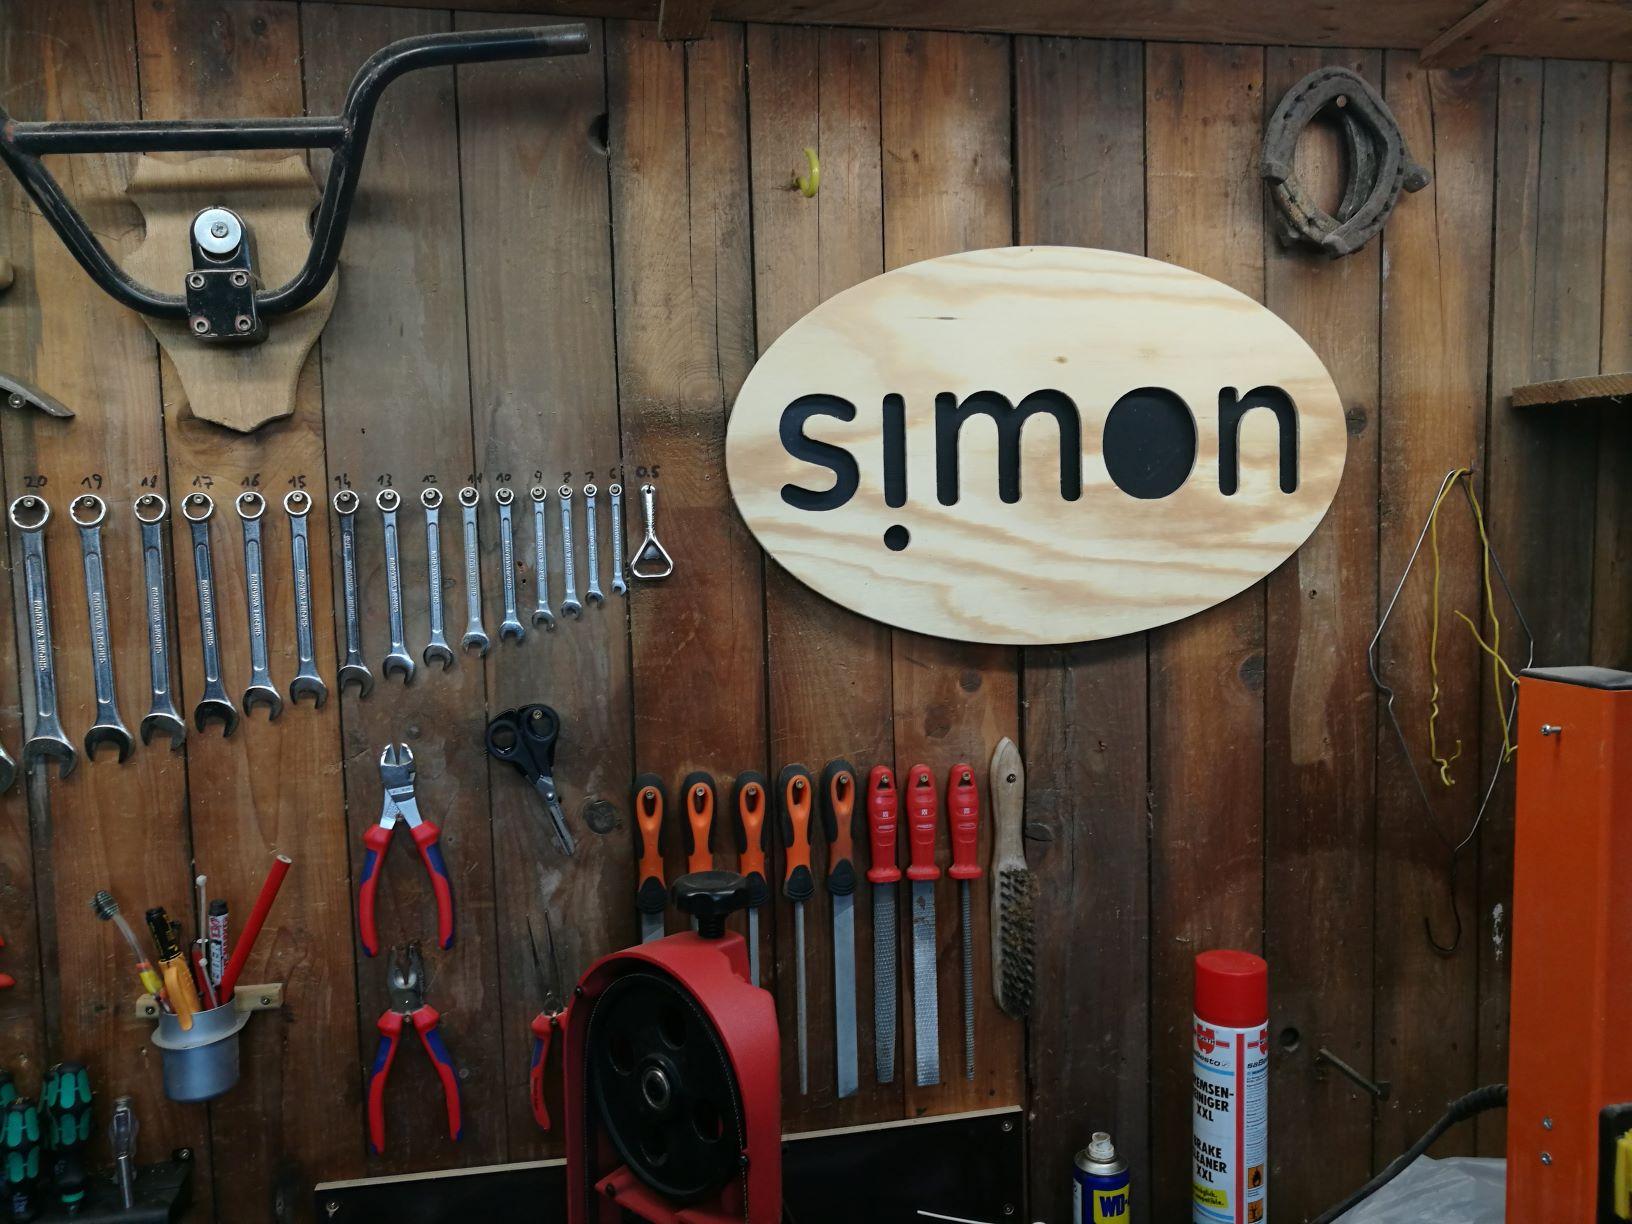 simon_makes shop sign 2.jpg